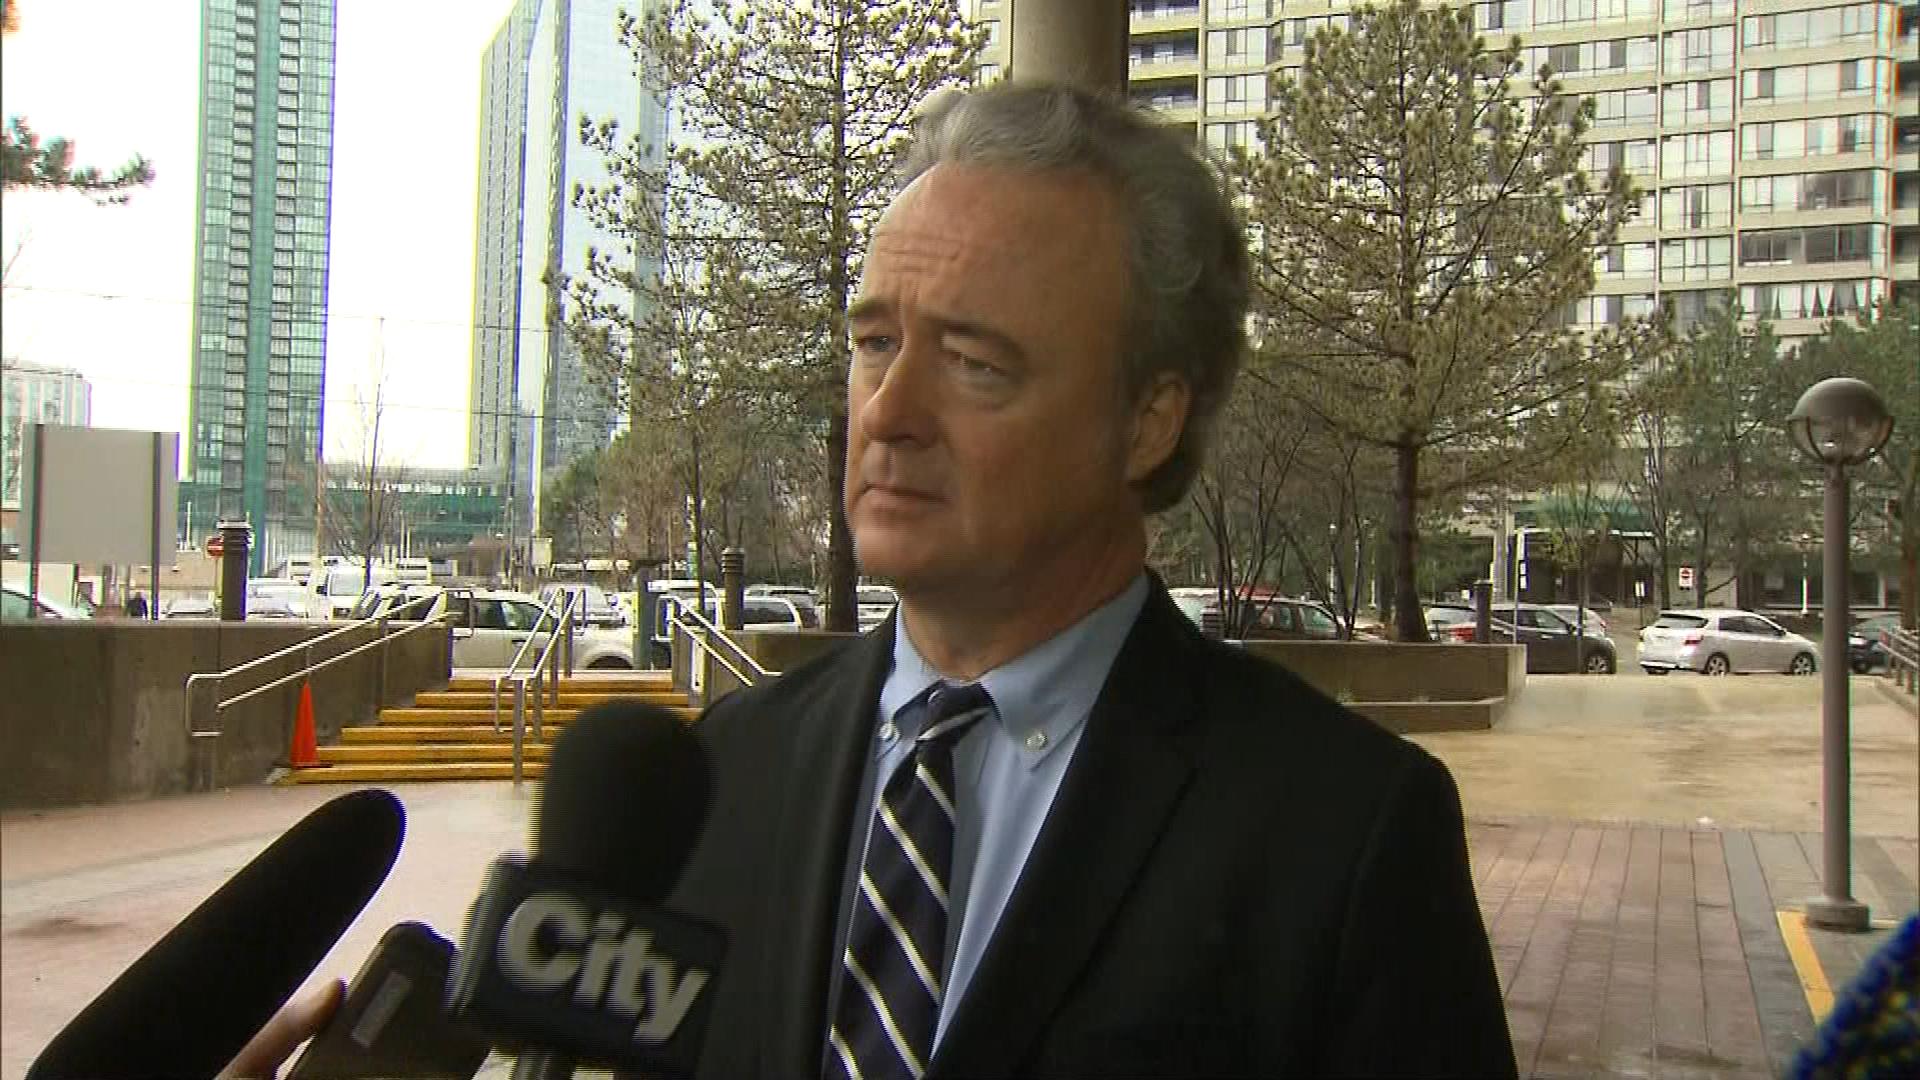 Warren Kinsella talks to CityNews in Toronto on April 25, 2017. CITYNEWS